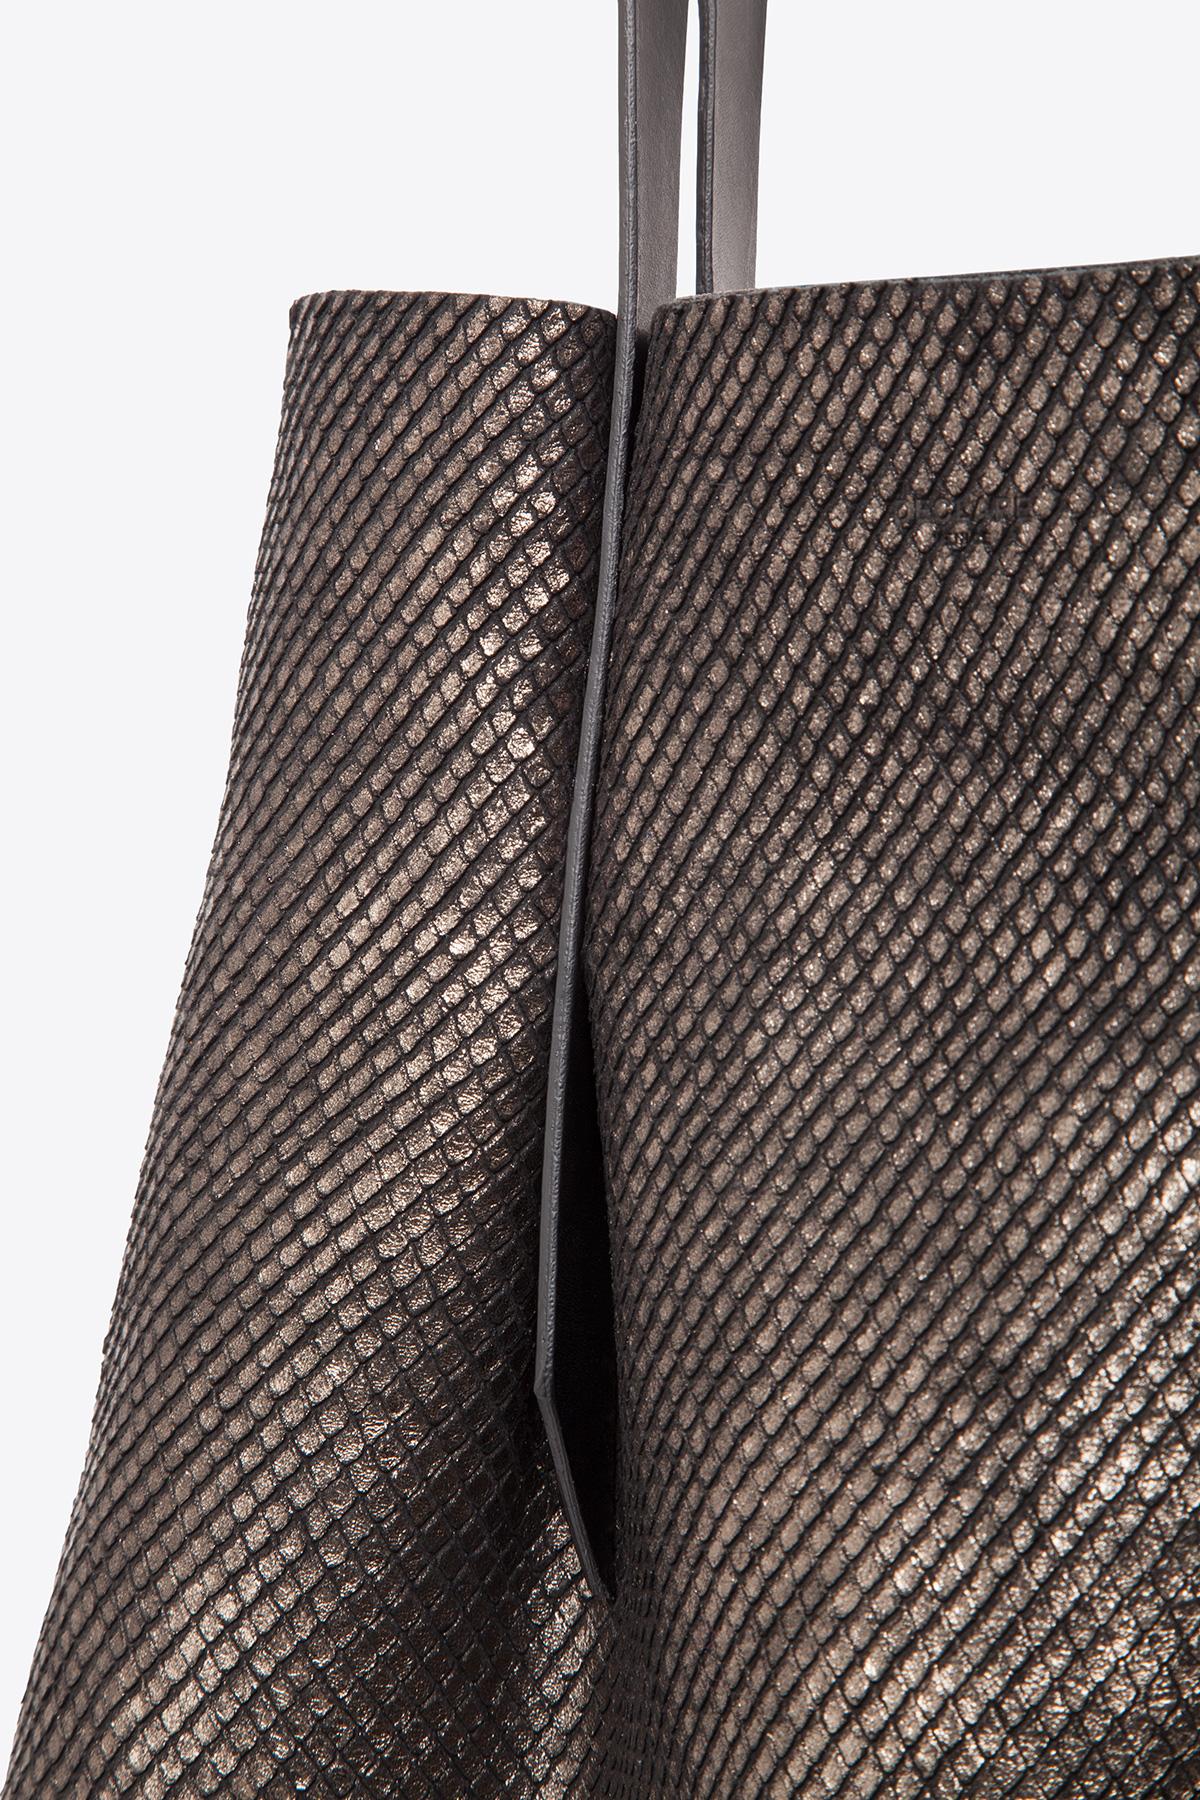 dclr006-shoppingbag-a24-backsnakebronze-detail